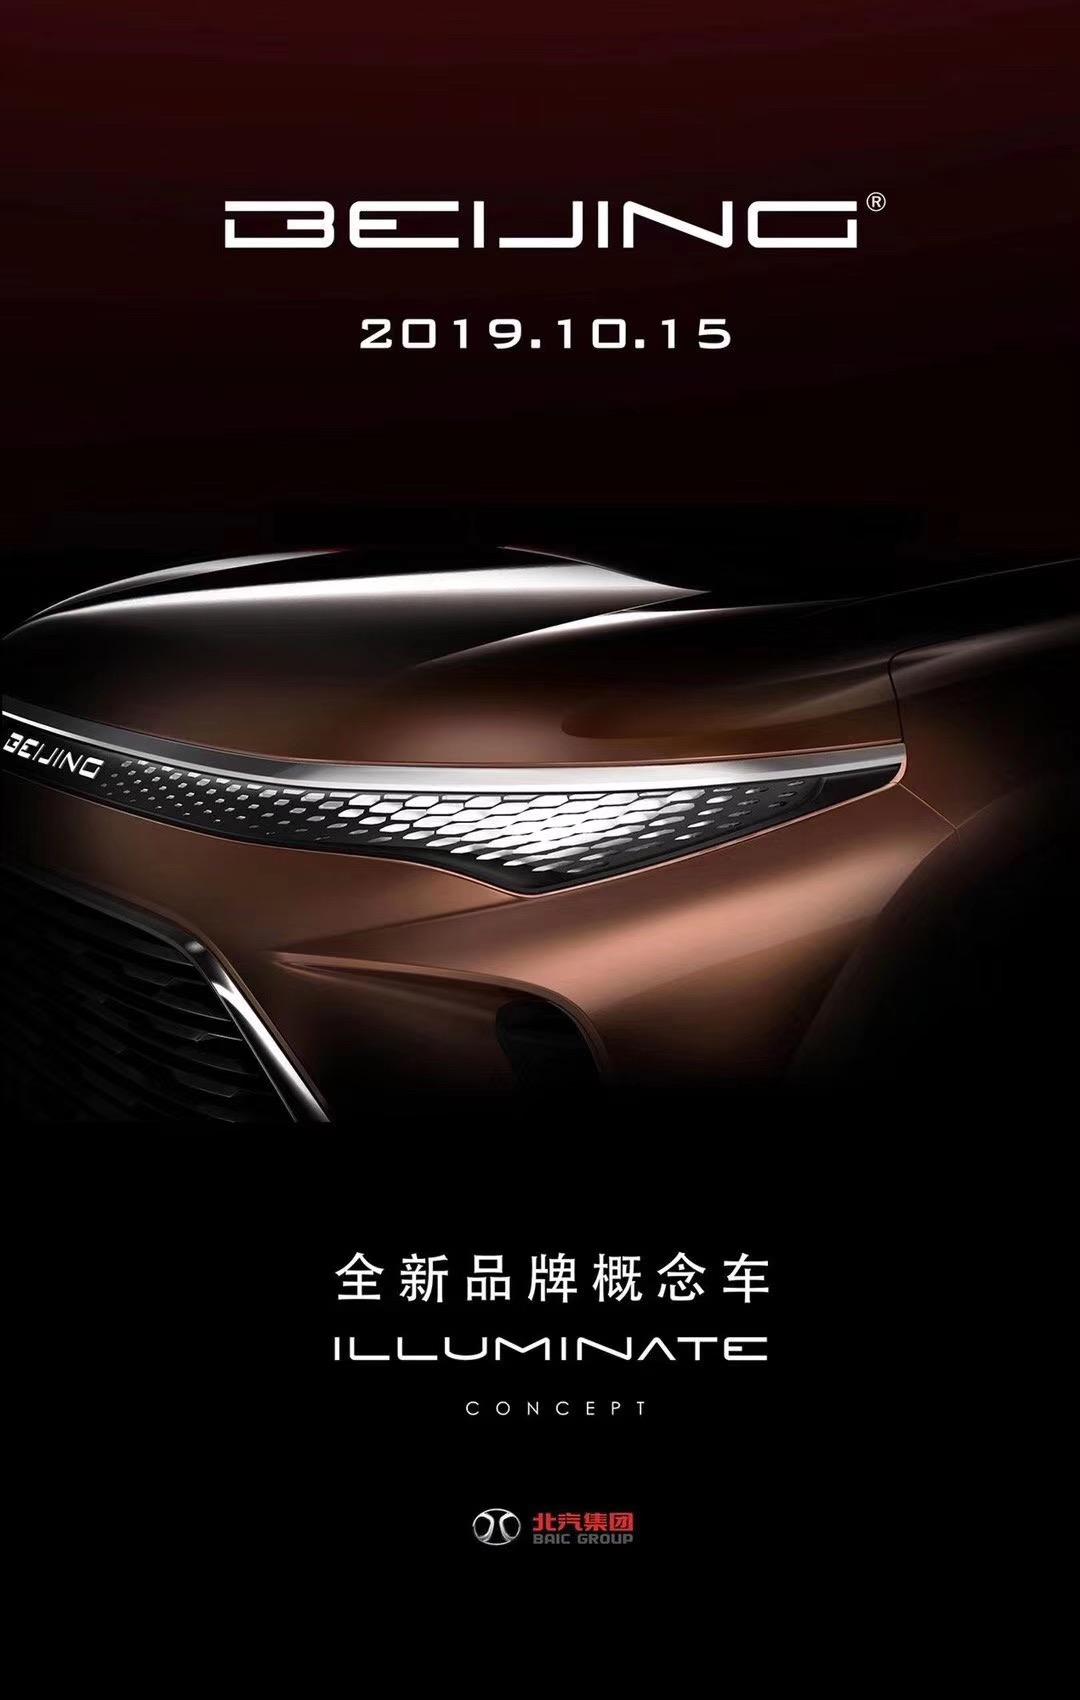 BEIJING品牌首款概念车预告图发布 将于10月15日亮相